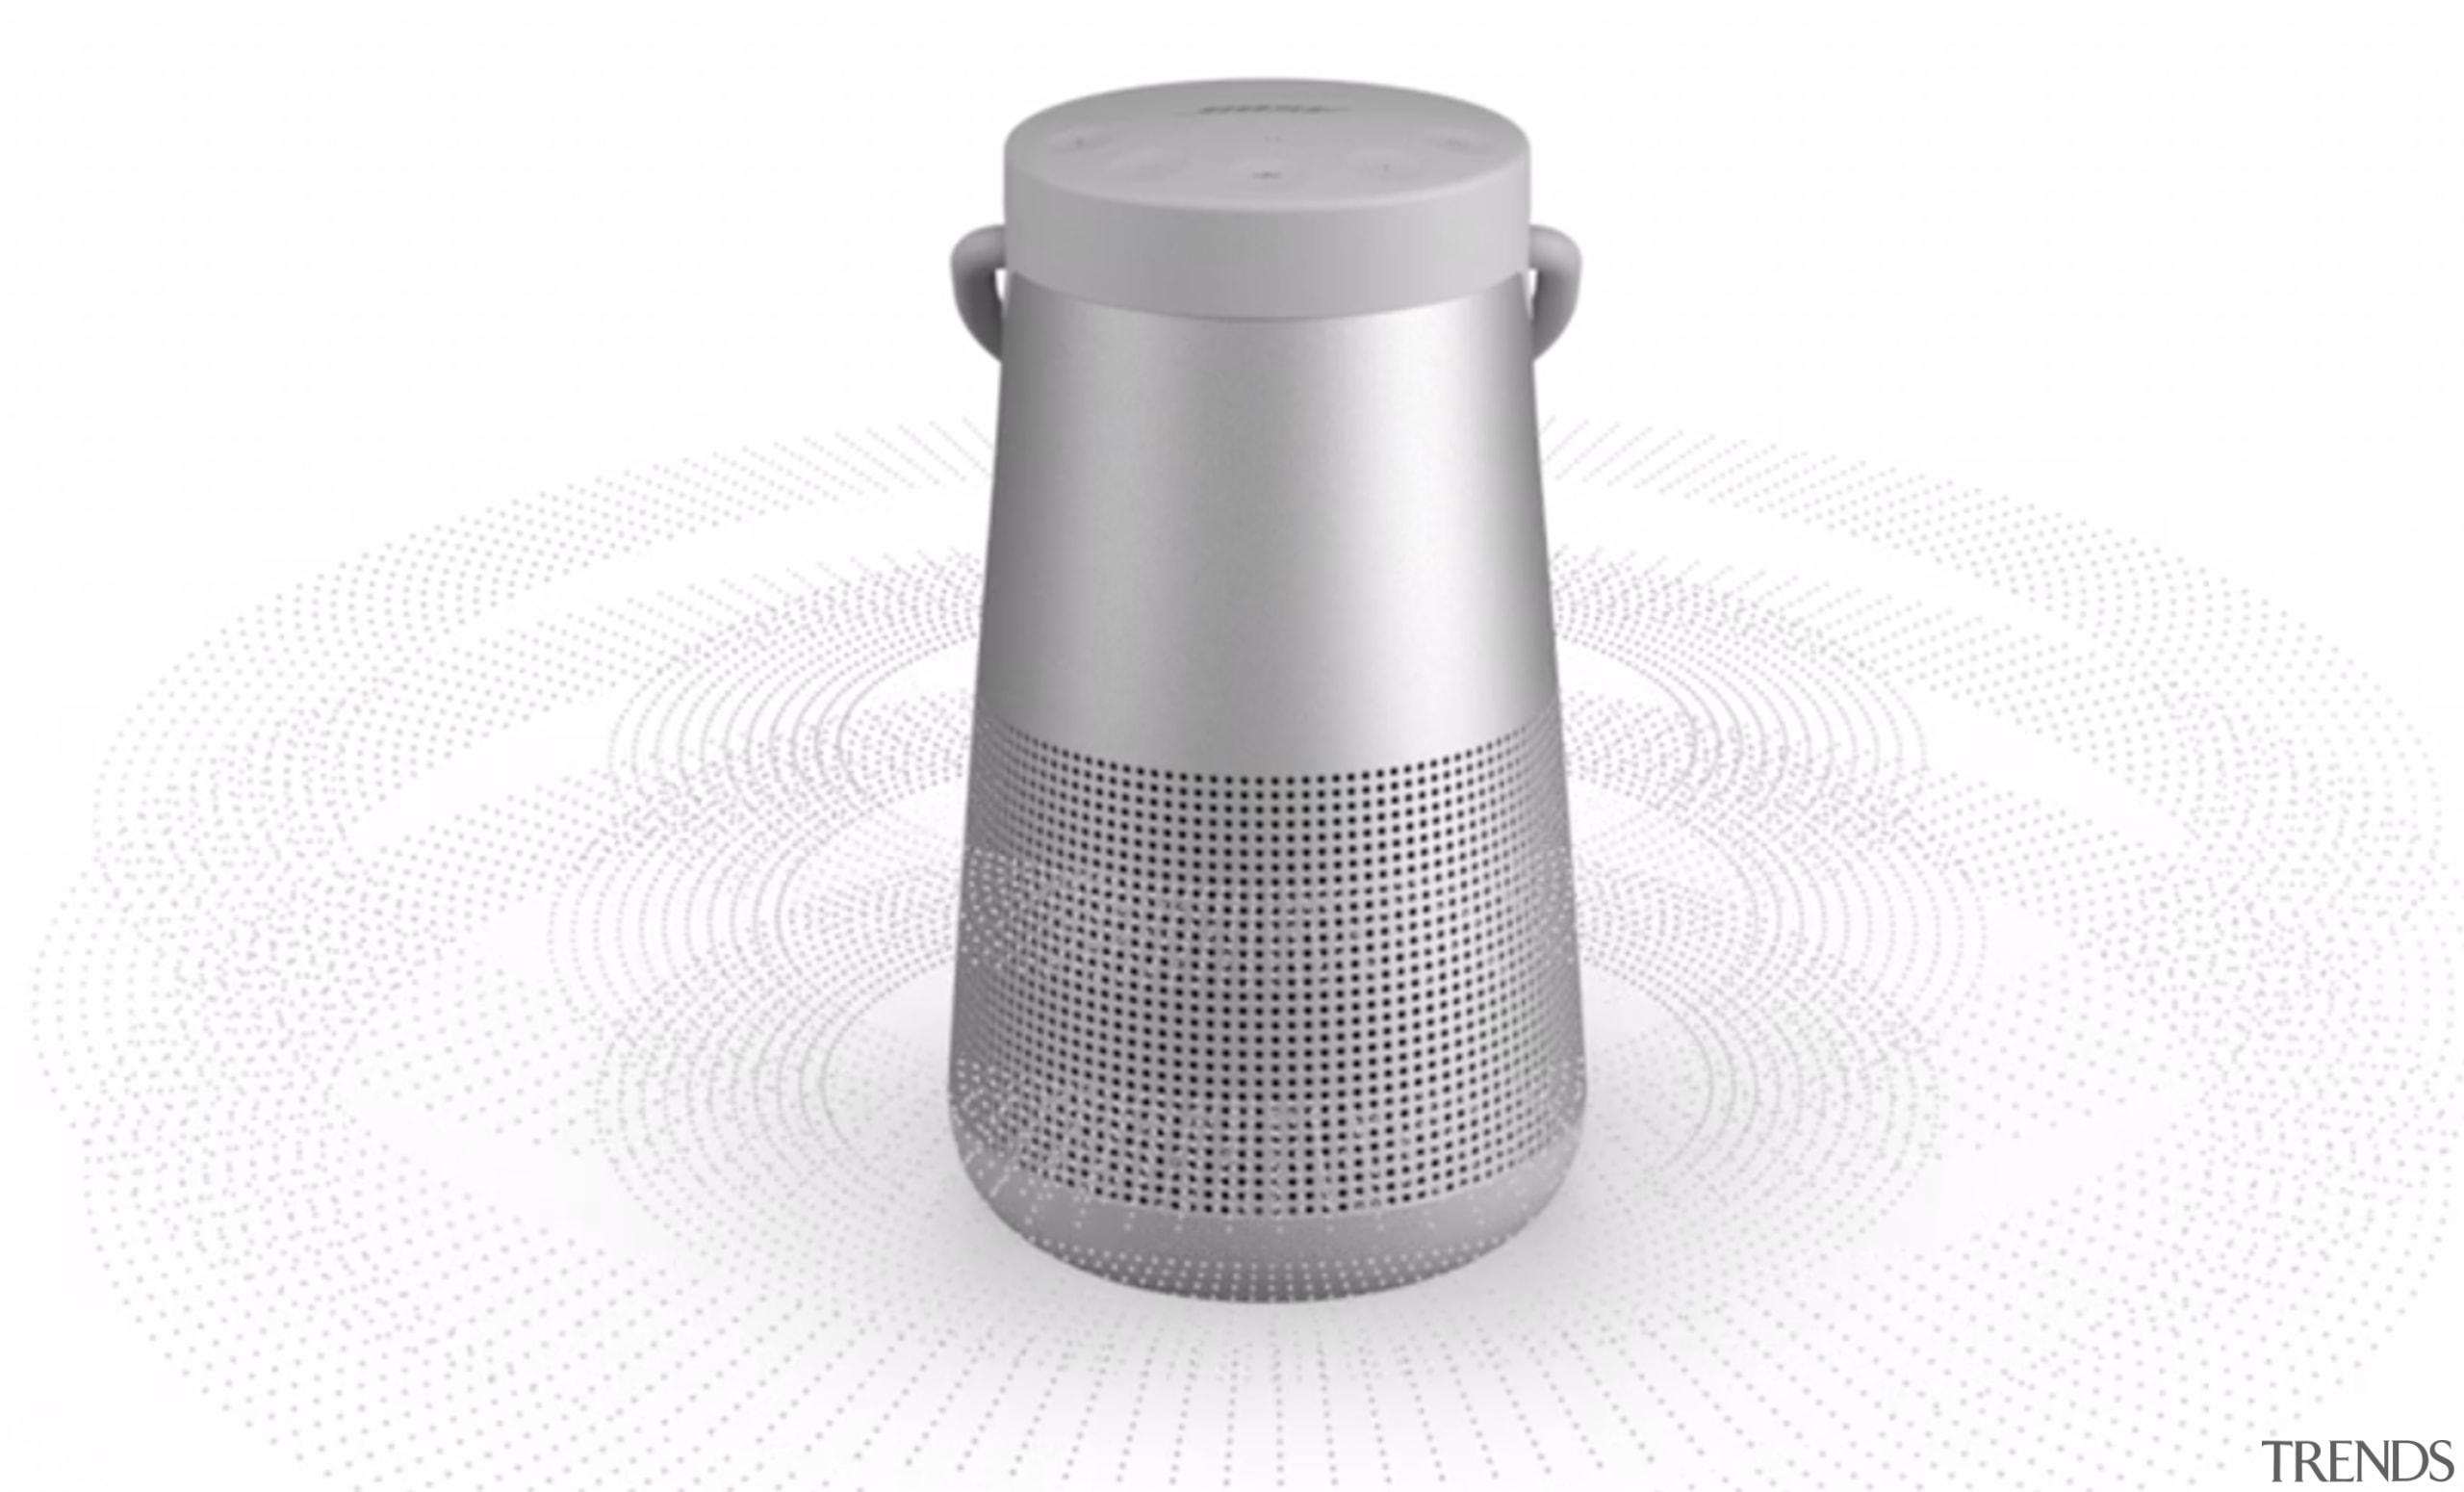 Bose Soundlink Revolve+ Wireless Speaker - Bose Soundlink cylinder, hardware, product, white